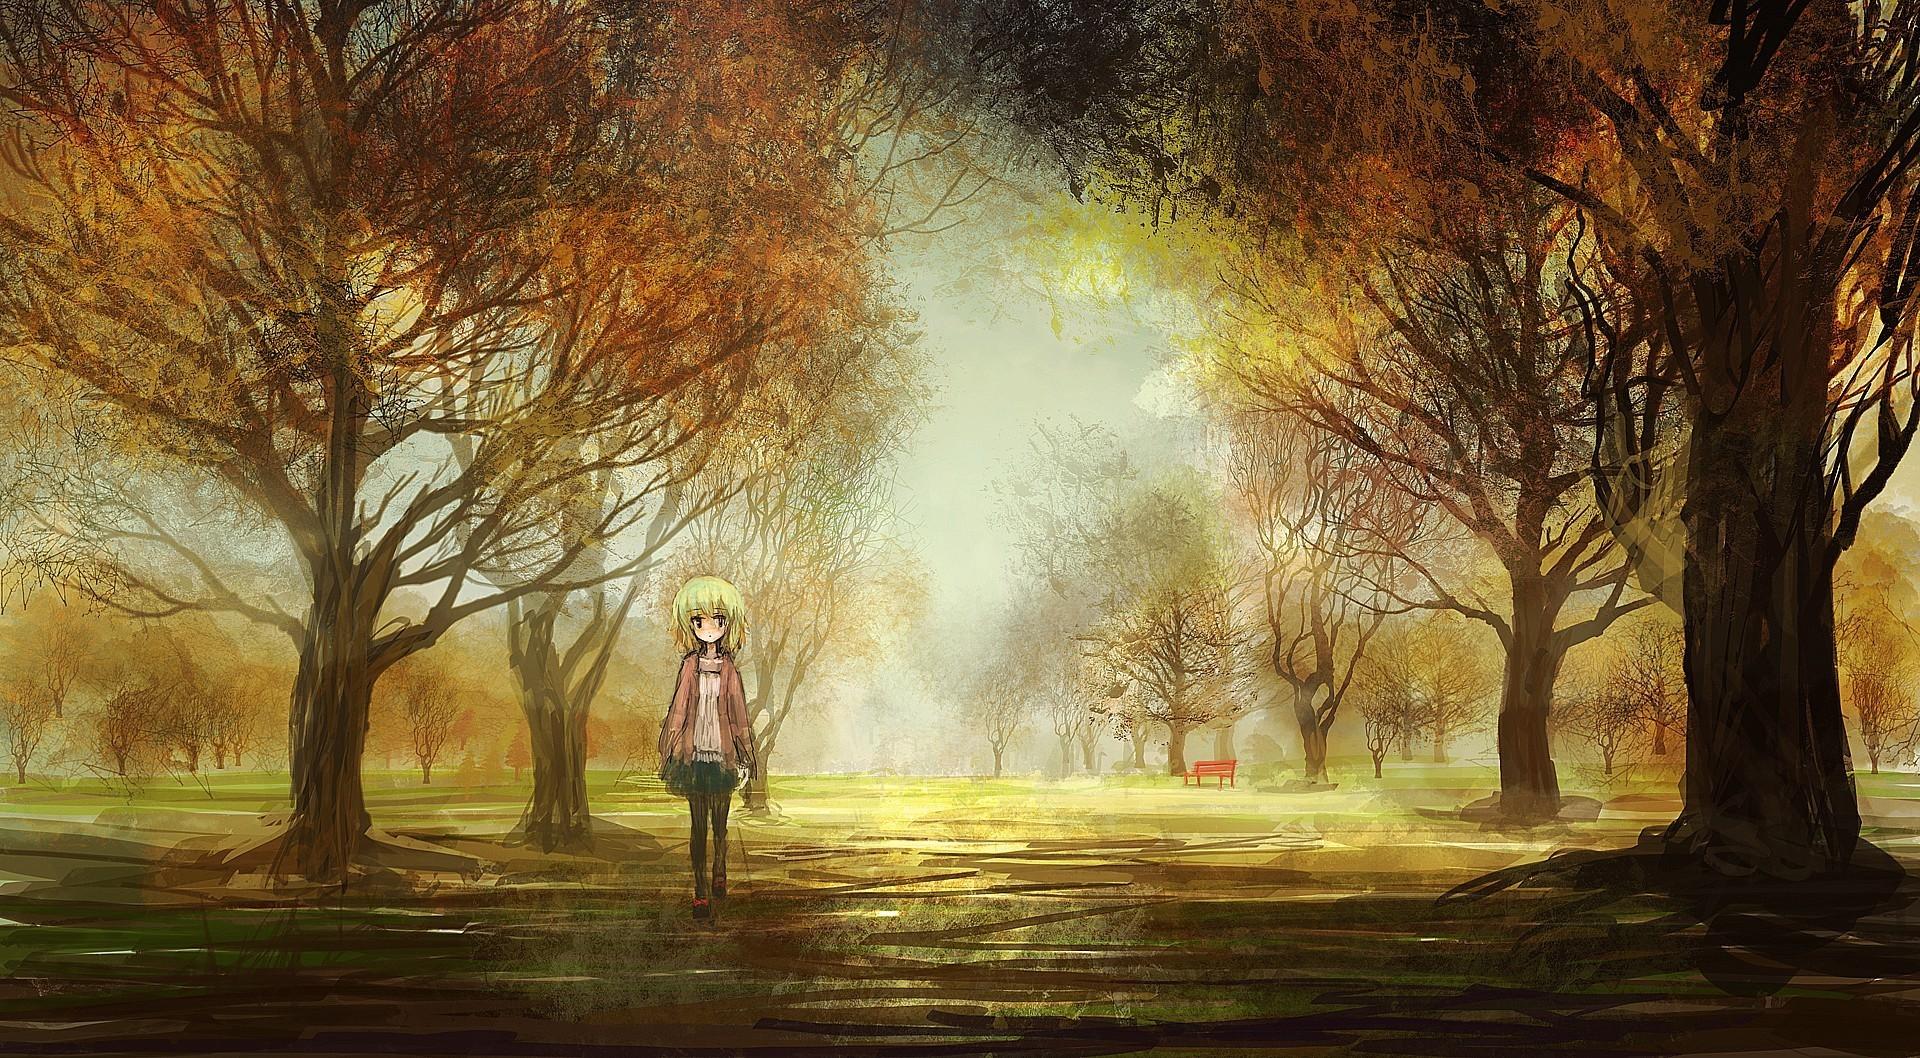 Original art girl landscapes anime trees park autumn fall